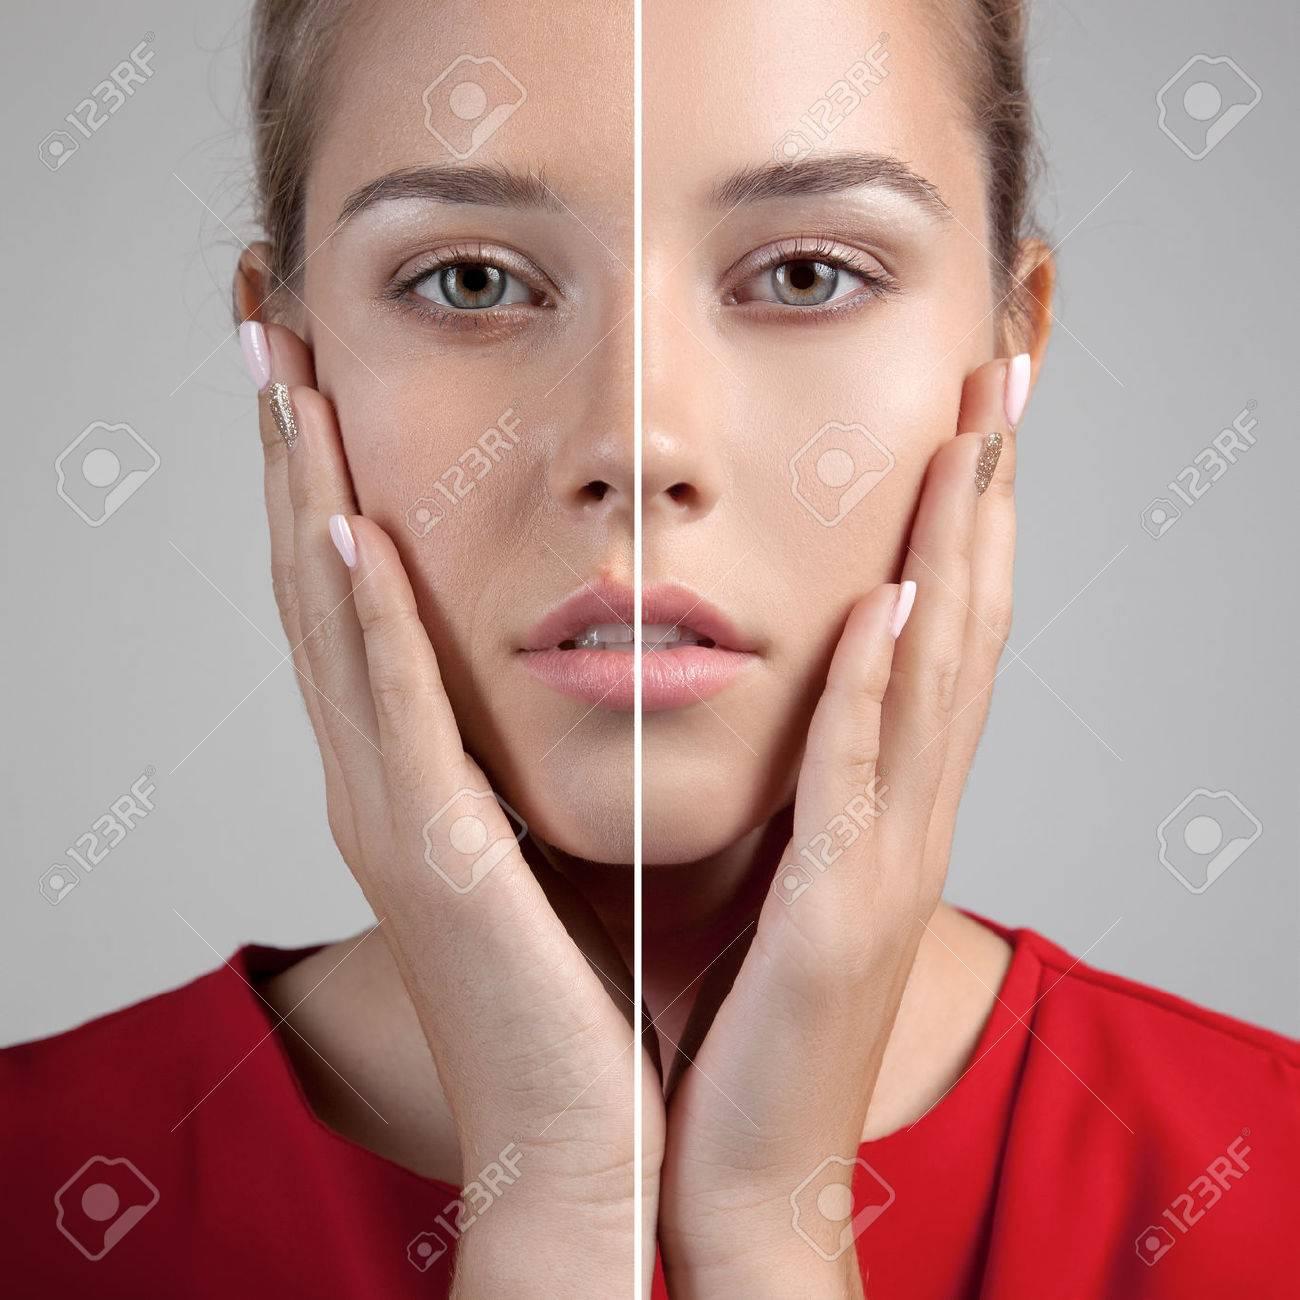 http://n3.datasn.io/data/api/v1/n3zm/image_of_skin_disease_5/by_table/skin_disease_image_download_access/c8/5d/11/69/c85d1169920795fa8b32bbfd9aaafbd9fd328b70.jpg